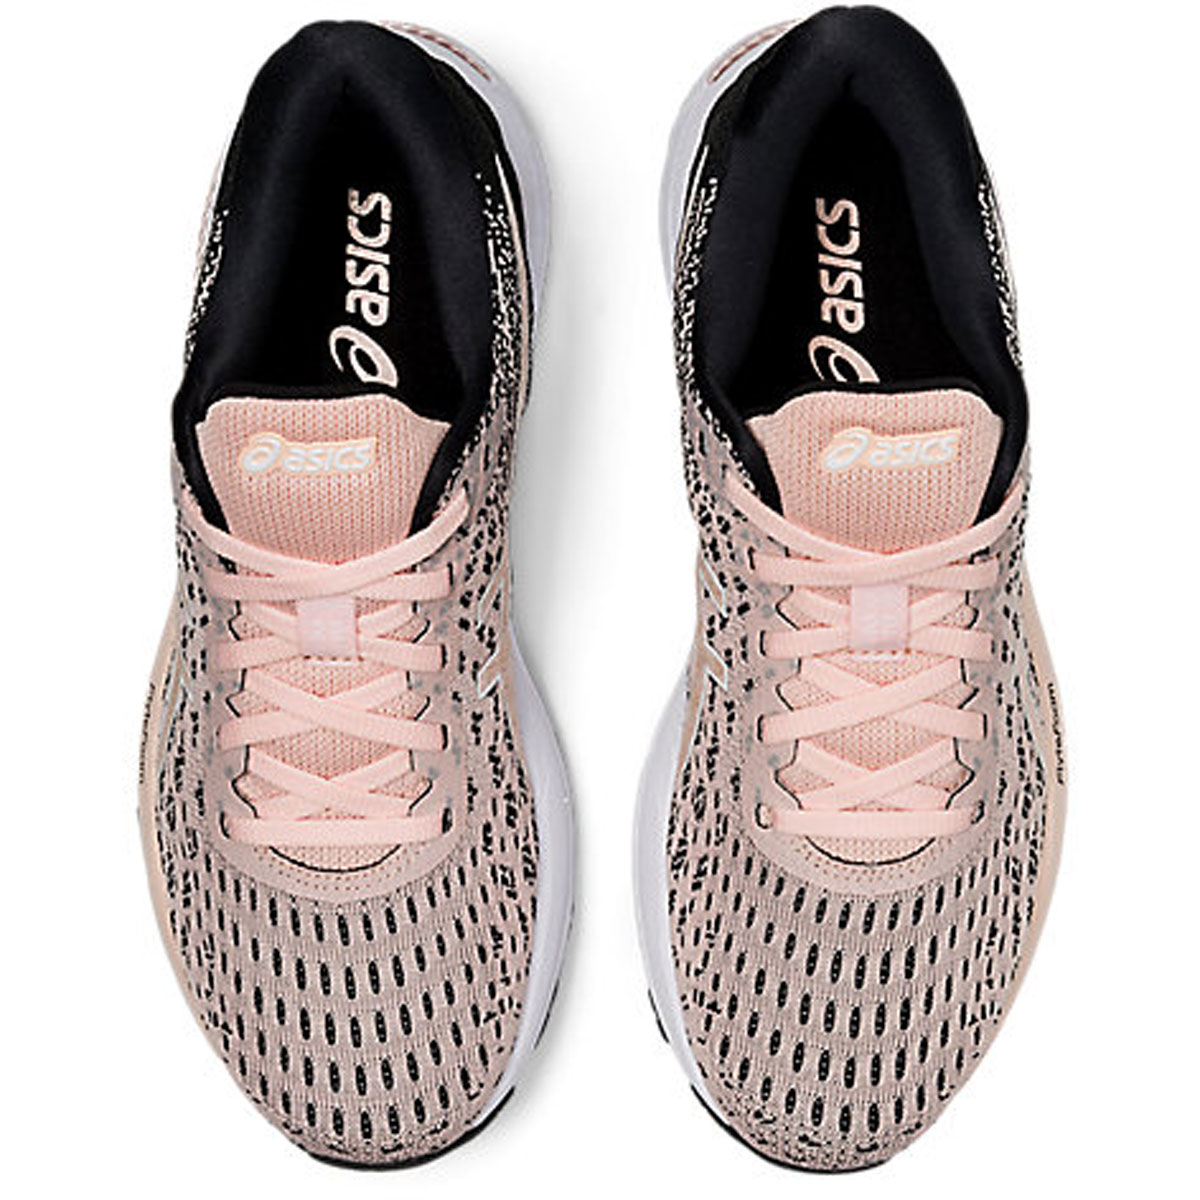 Women's Asics Gel-Cumulus 22 Knit Running Shoe - Color: Breeze/Black - Size: 5 - Width: Regular, Breeze/Black, large, image 6